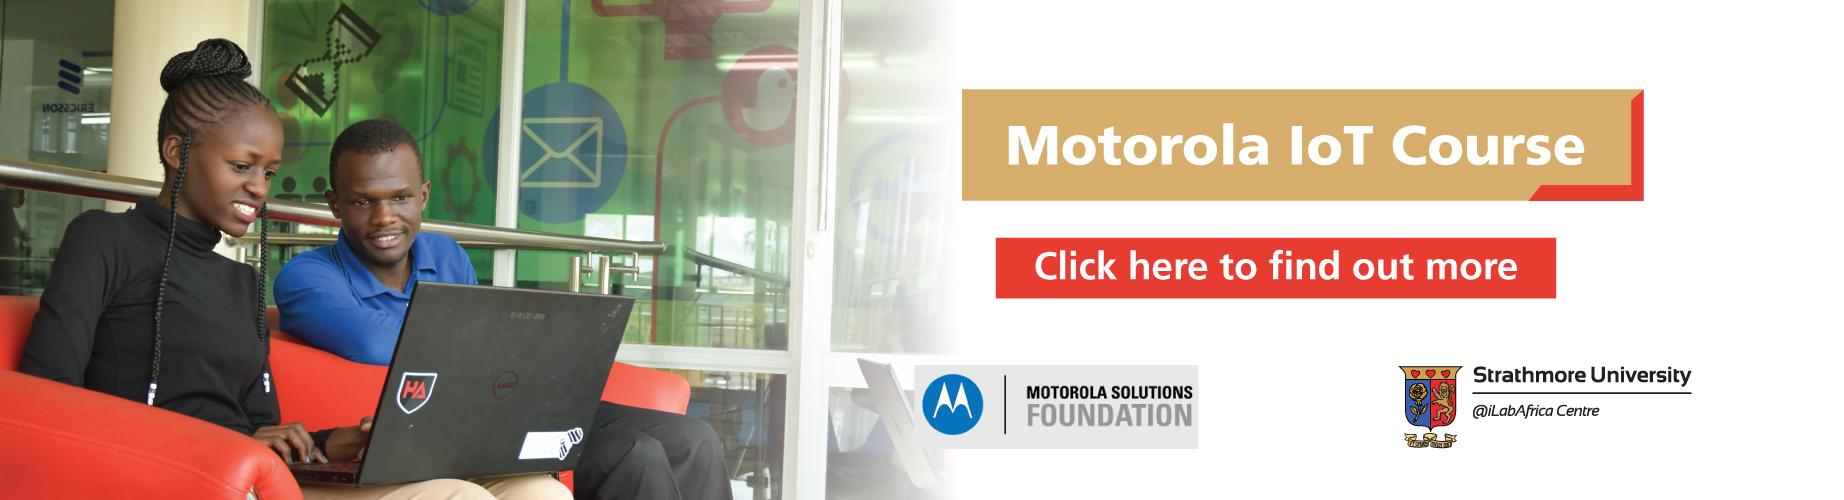 Motorola-banner-